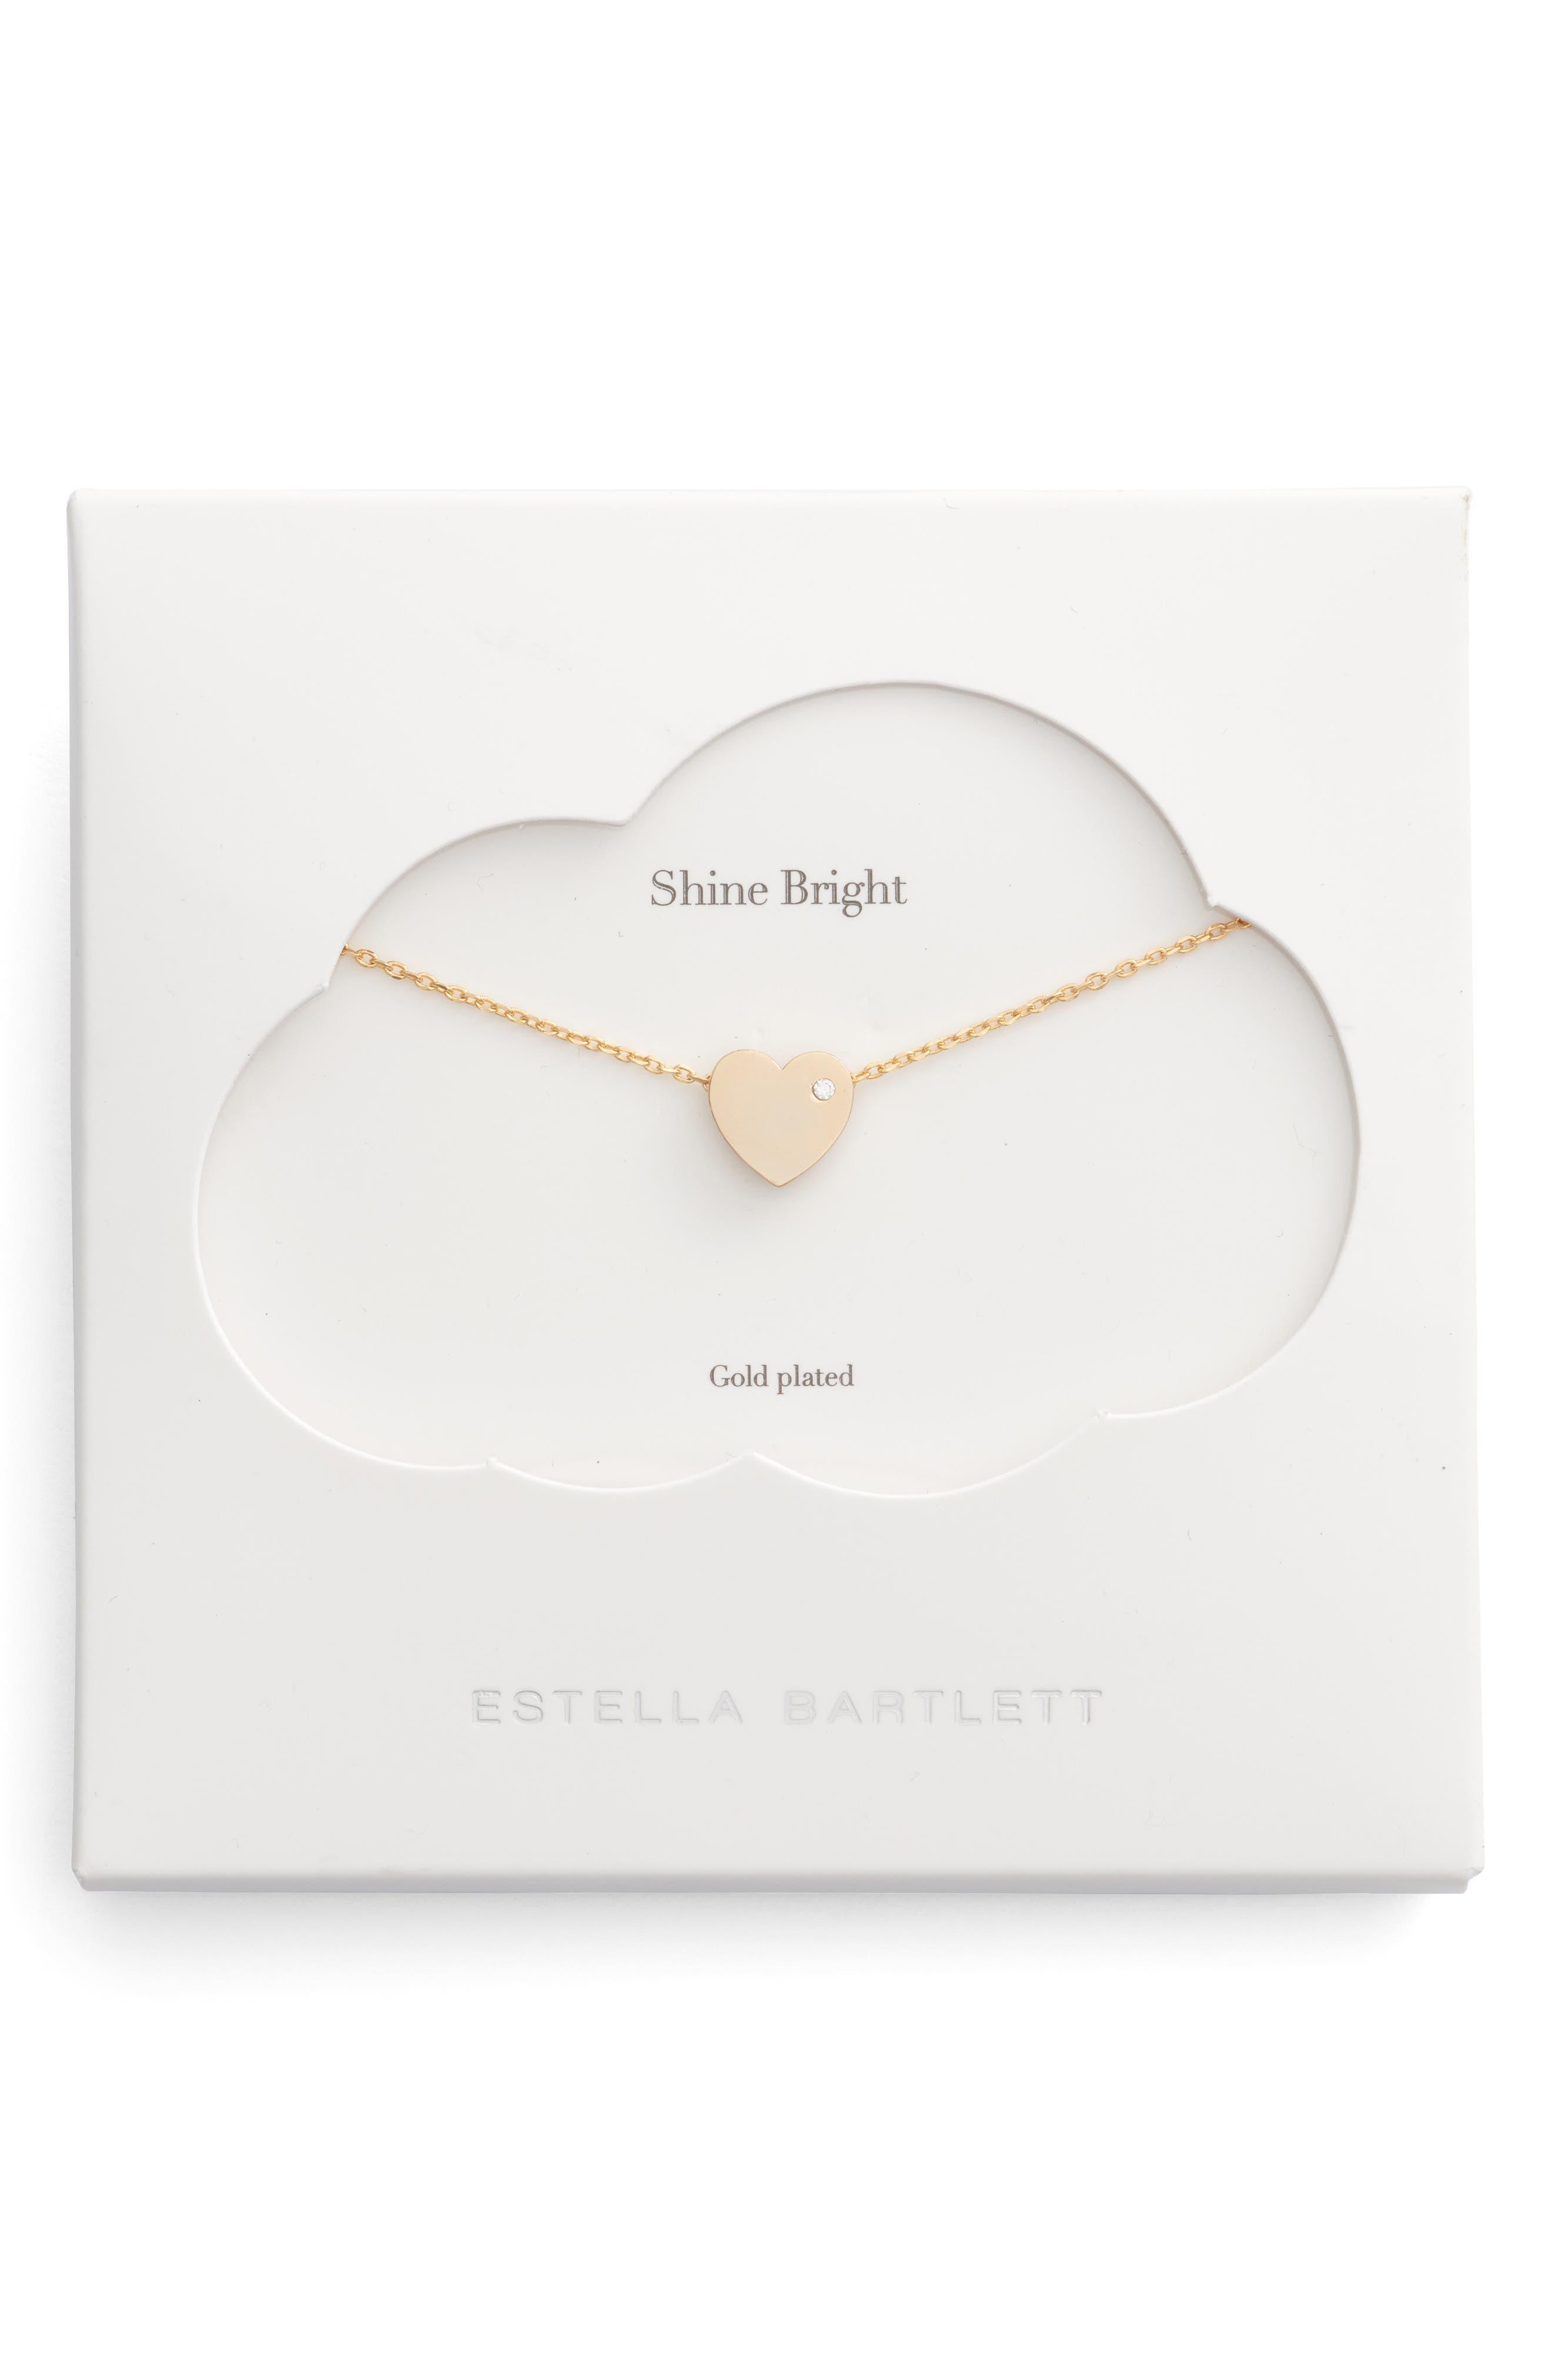 Alternate Image 1 Selected - Estella Bartlett Shine Bright Heart Necklace